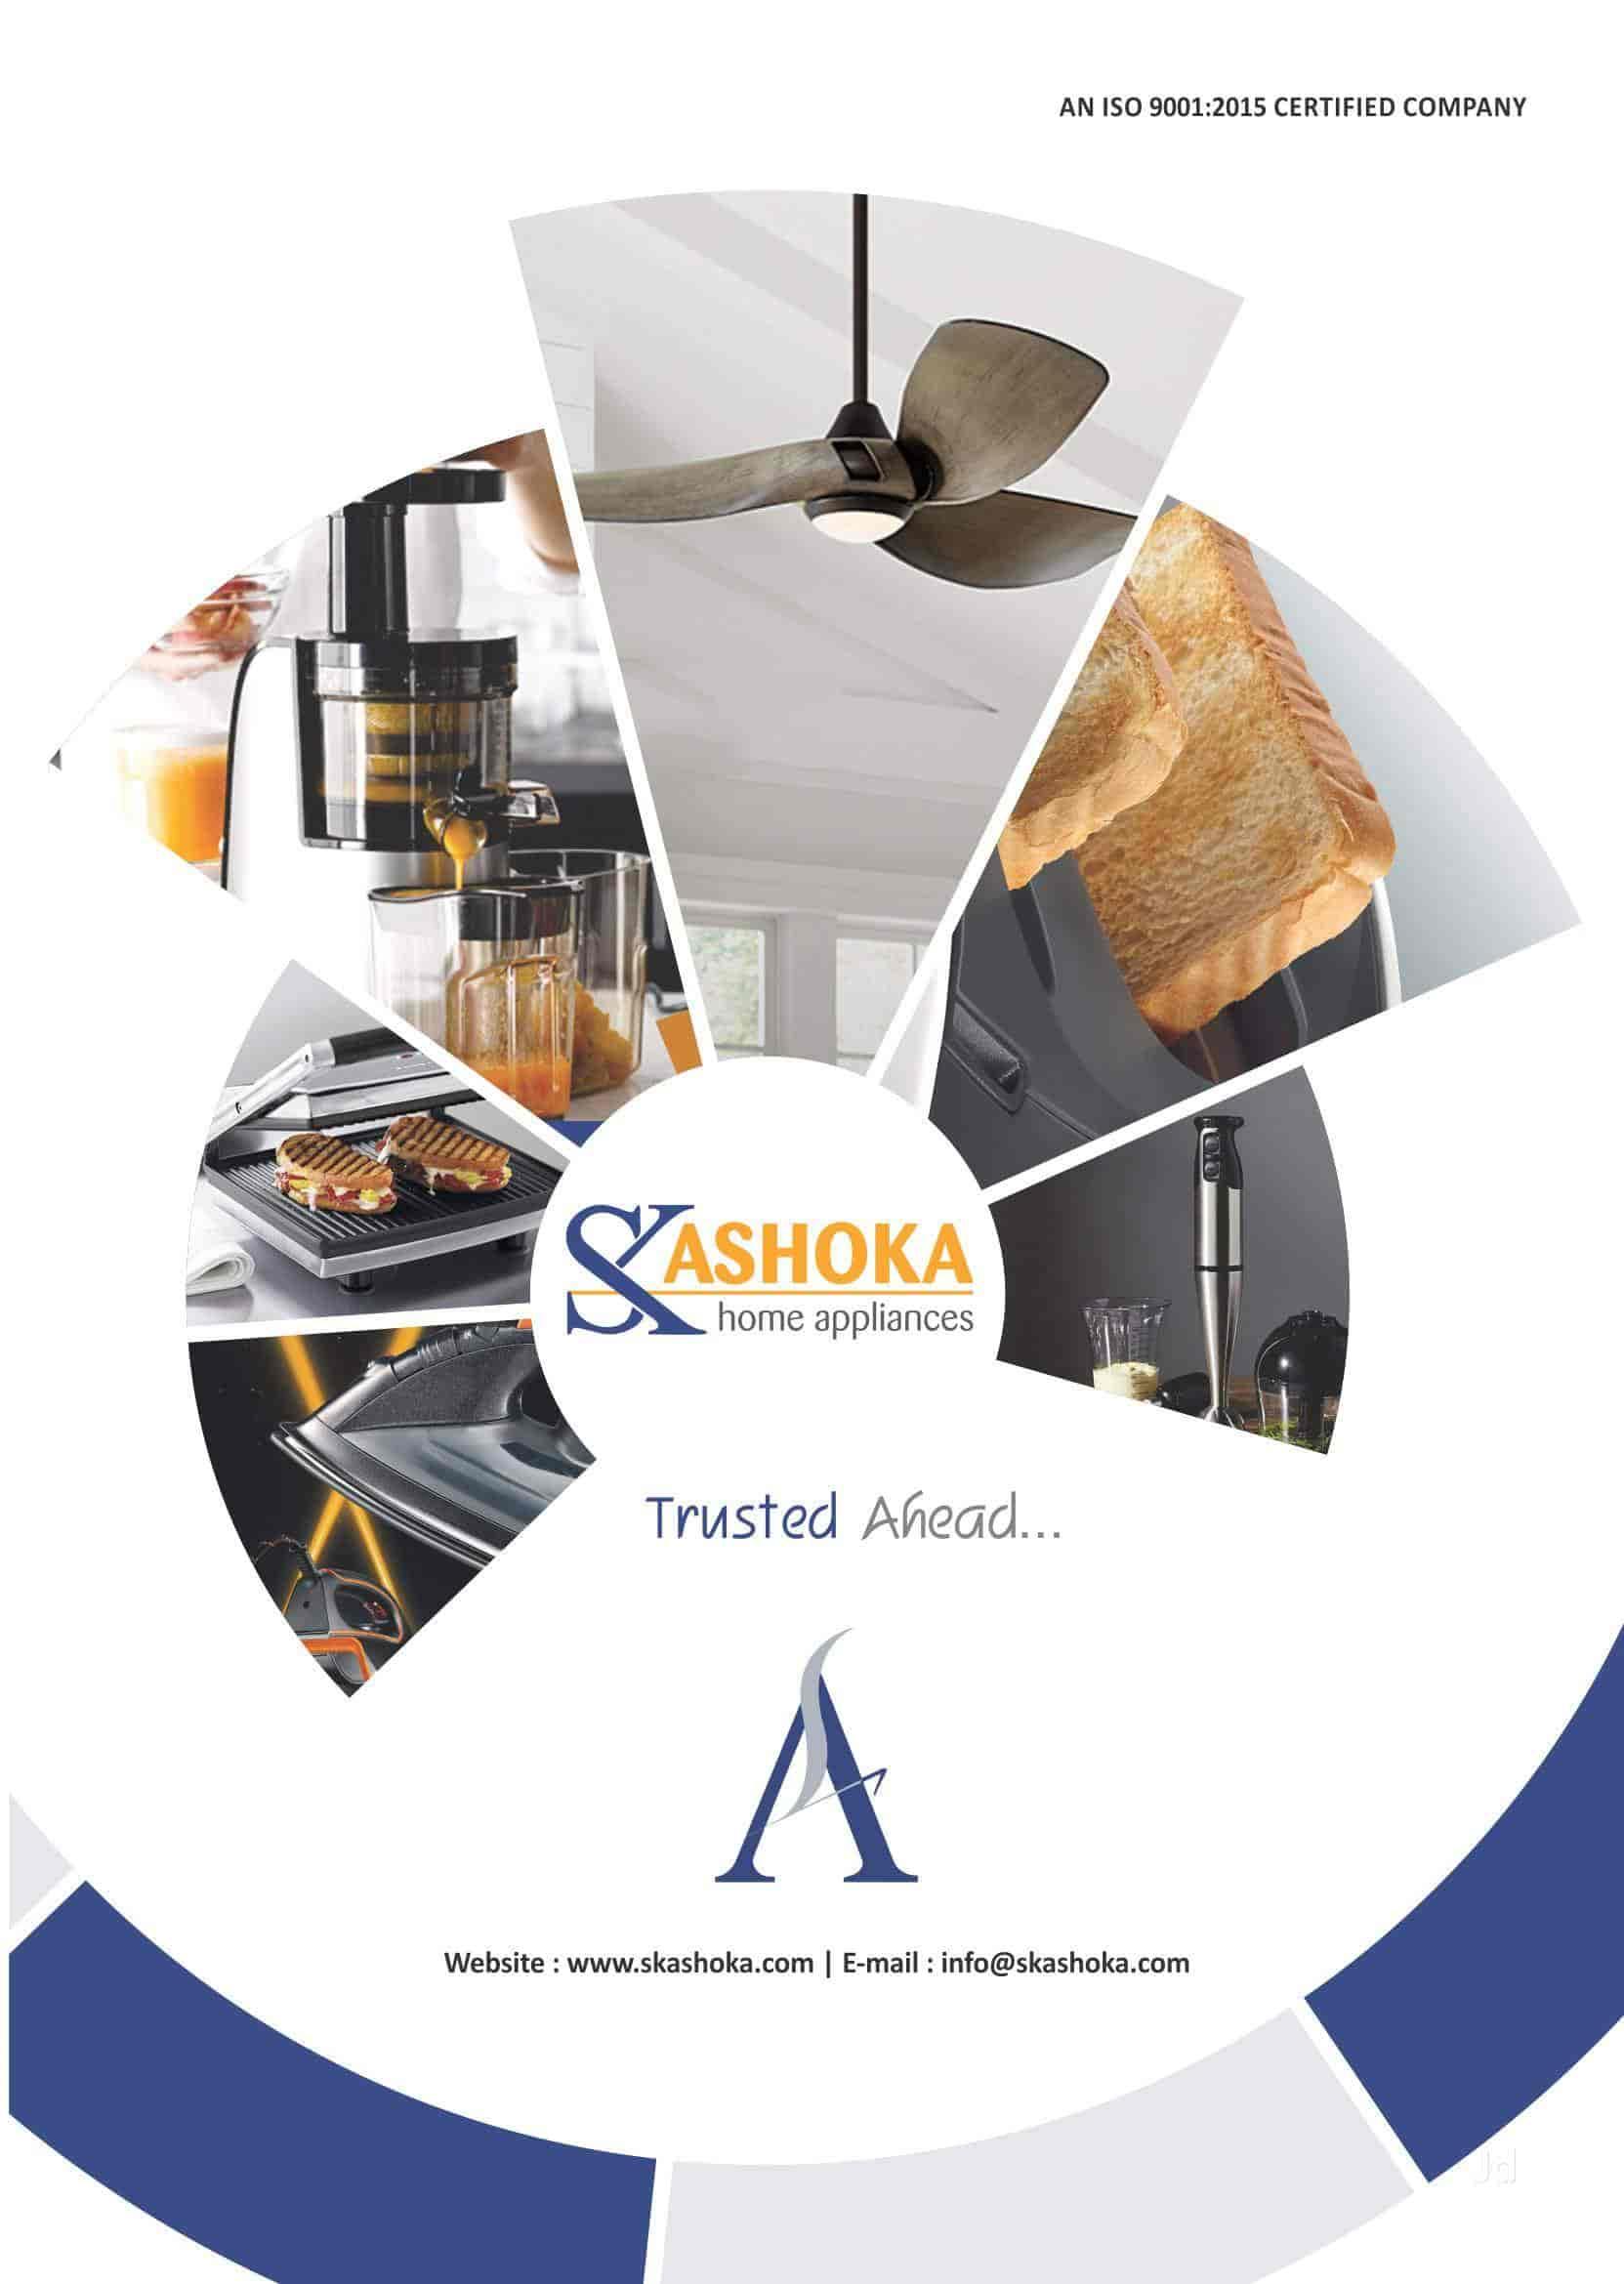 Skashoka Home Appliances Agra Road Kitchen Appliance